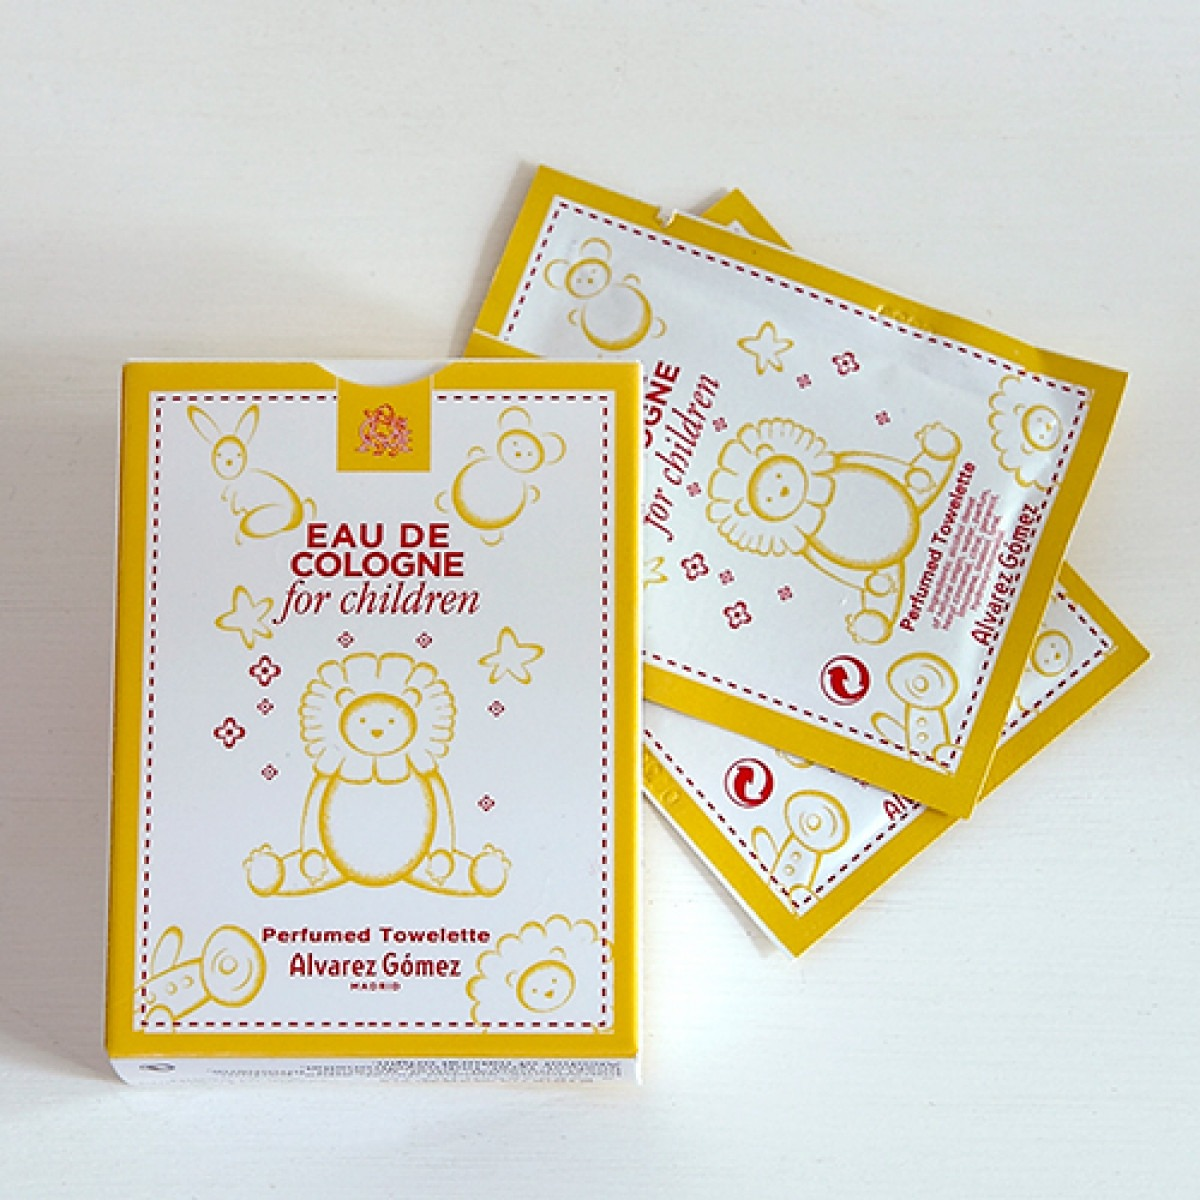 Alvarez Gomez childrens perfumed towelette x 10